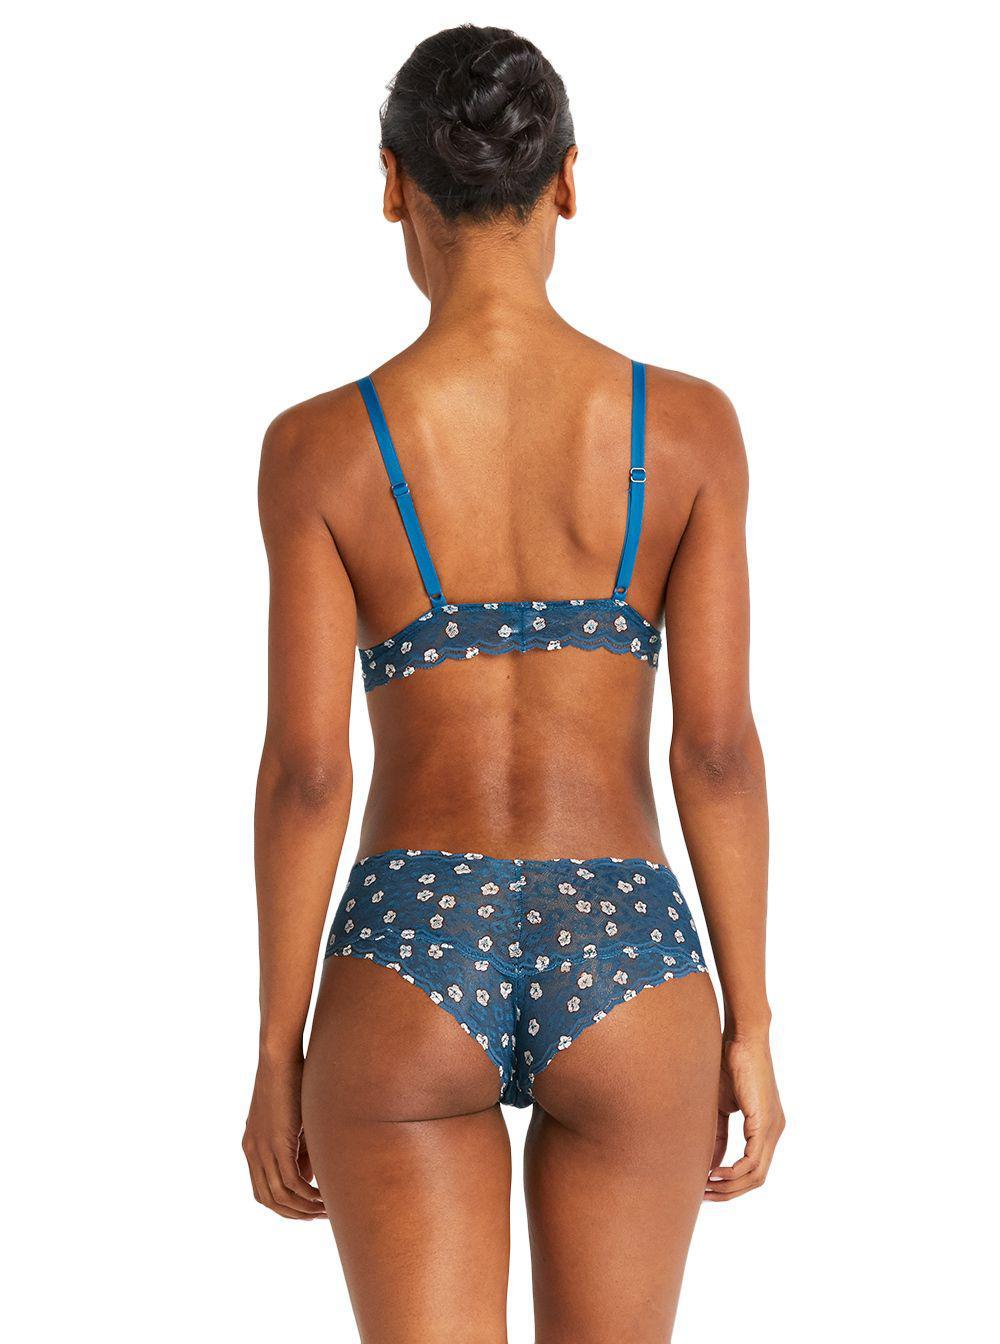 c9ec2416a01d20 Cosabella - Blue Sweet Treats Printed Bralette - Lyst. View fullscreen